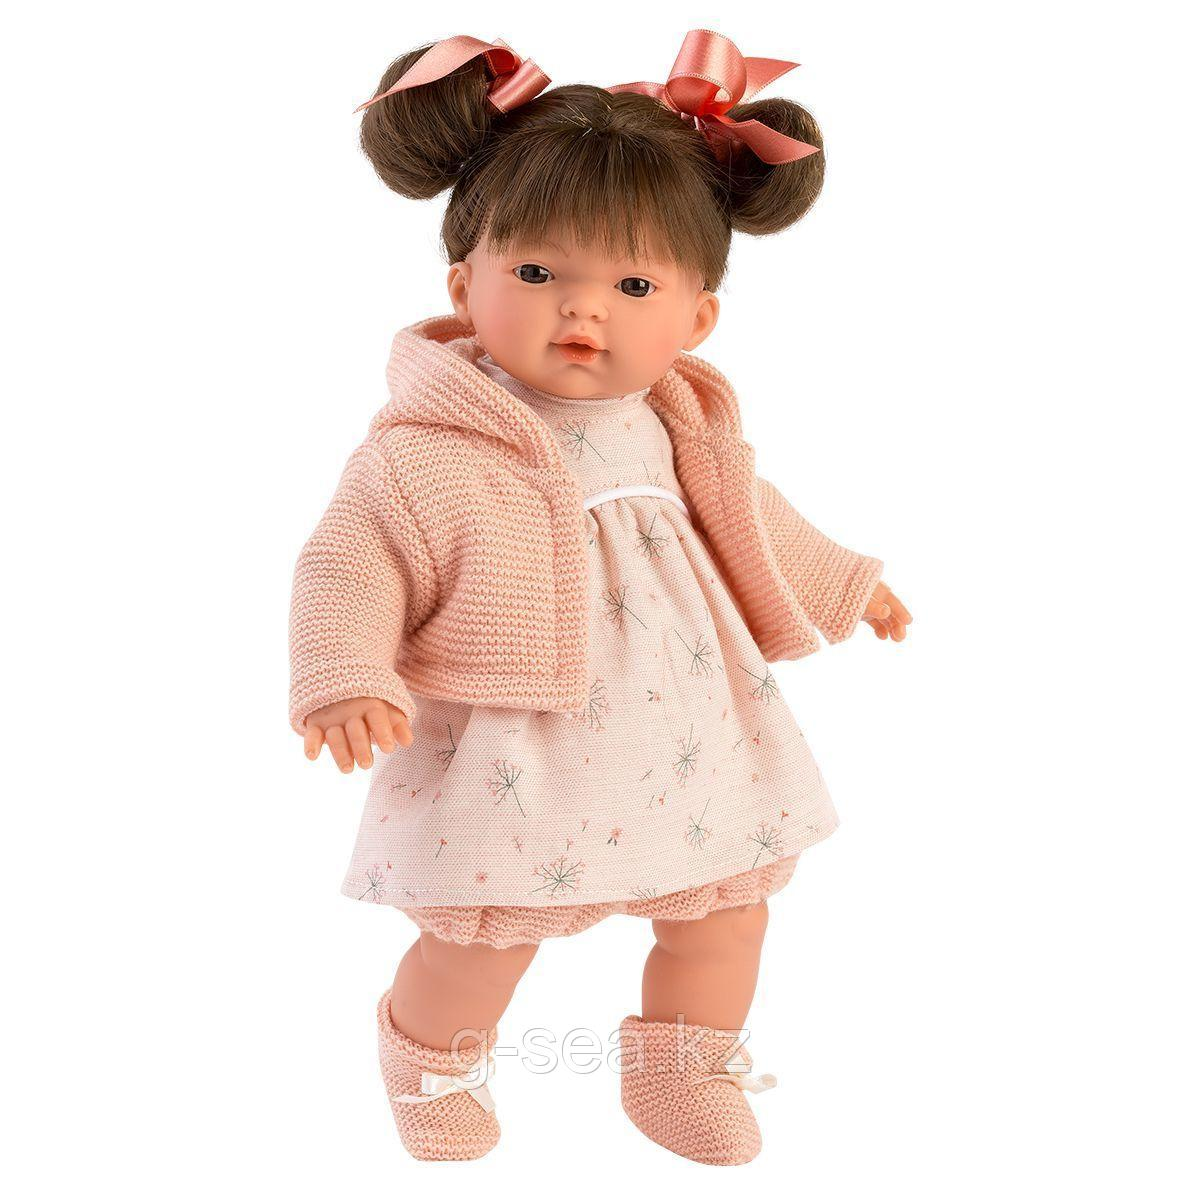 LLORENS: Кукла Рита 33 см., брюнетка в розовом жакете